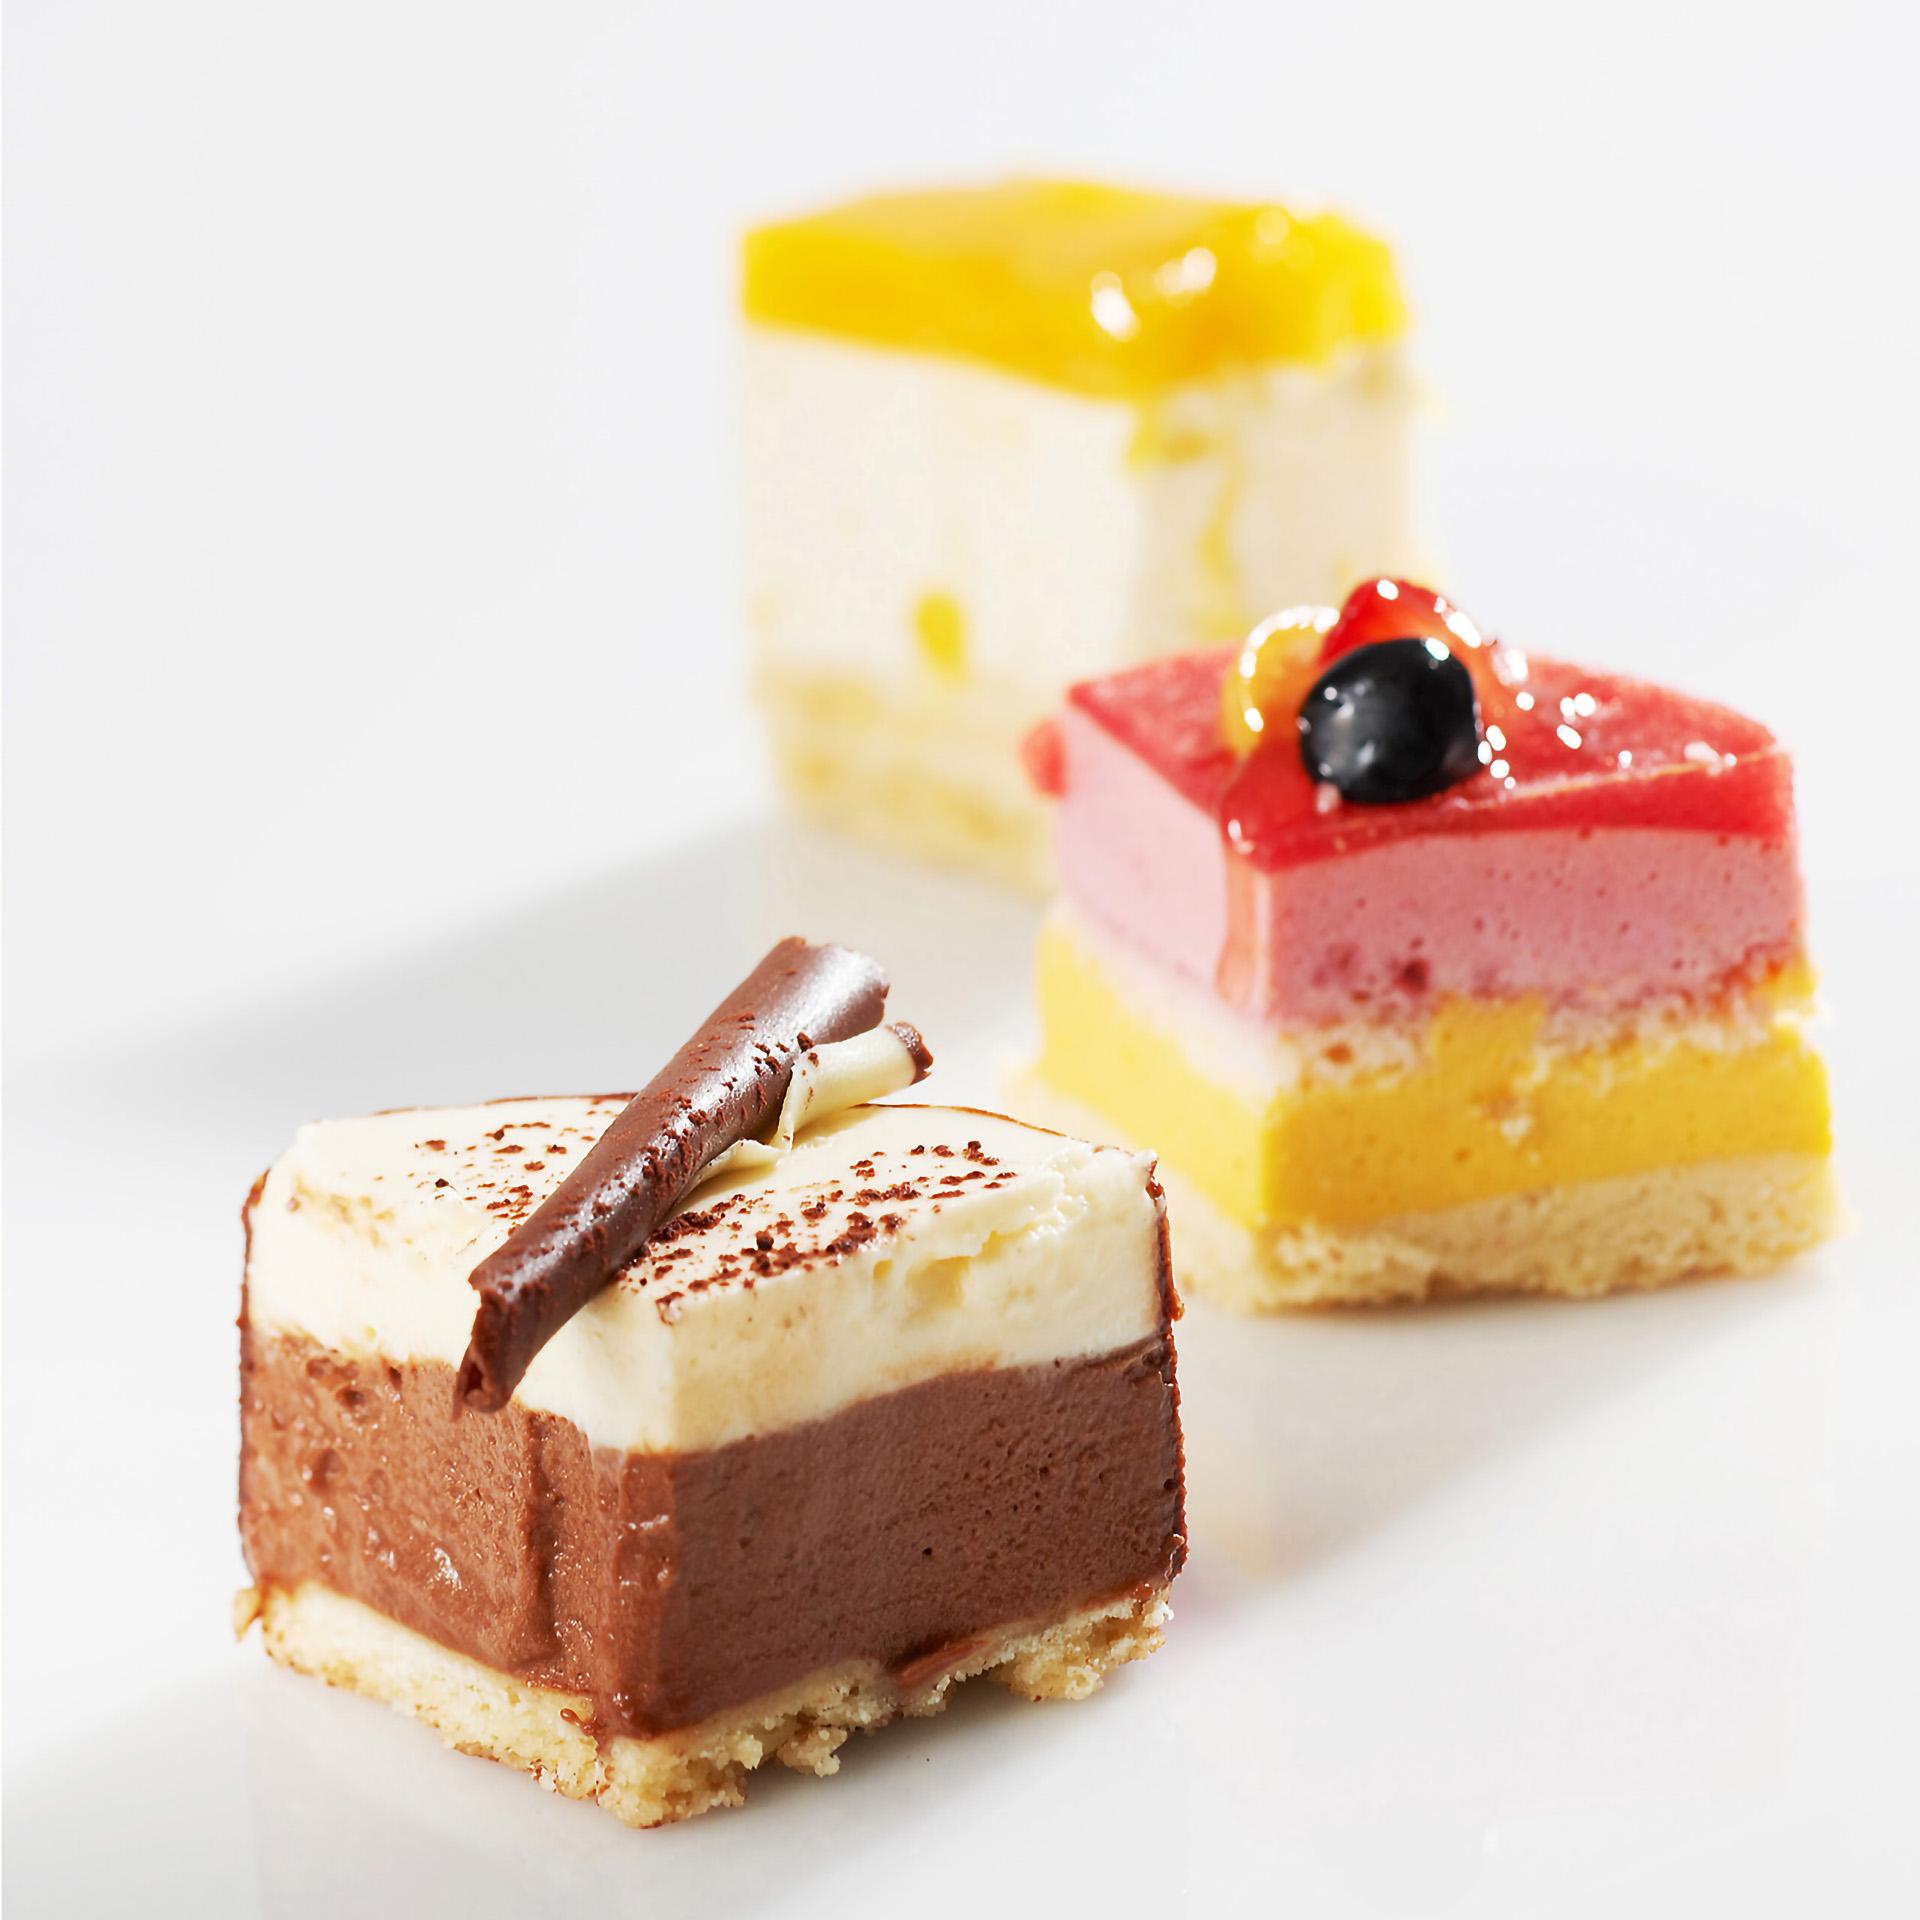 Fotodesign-matthias-schütz-mousse-au-chocolat-törtchen